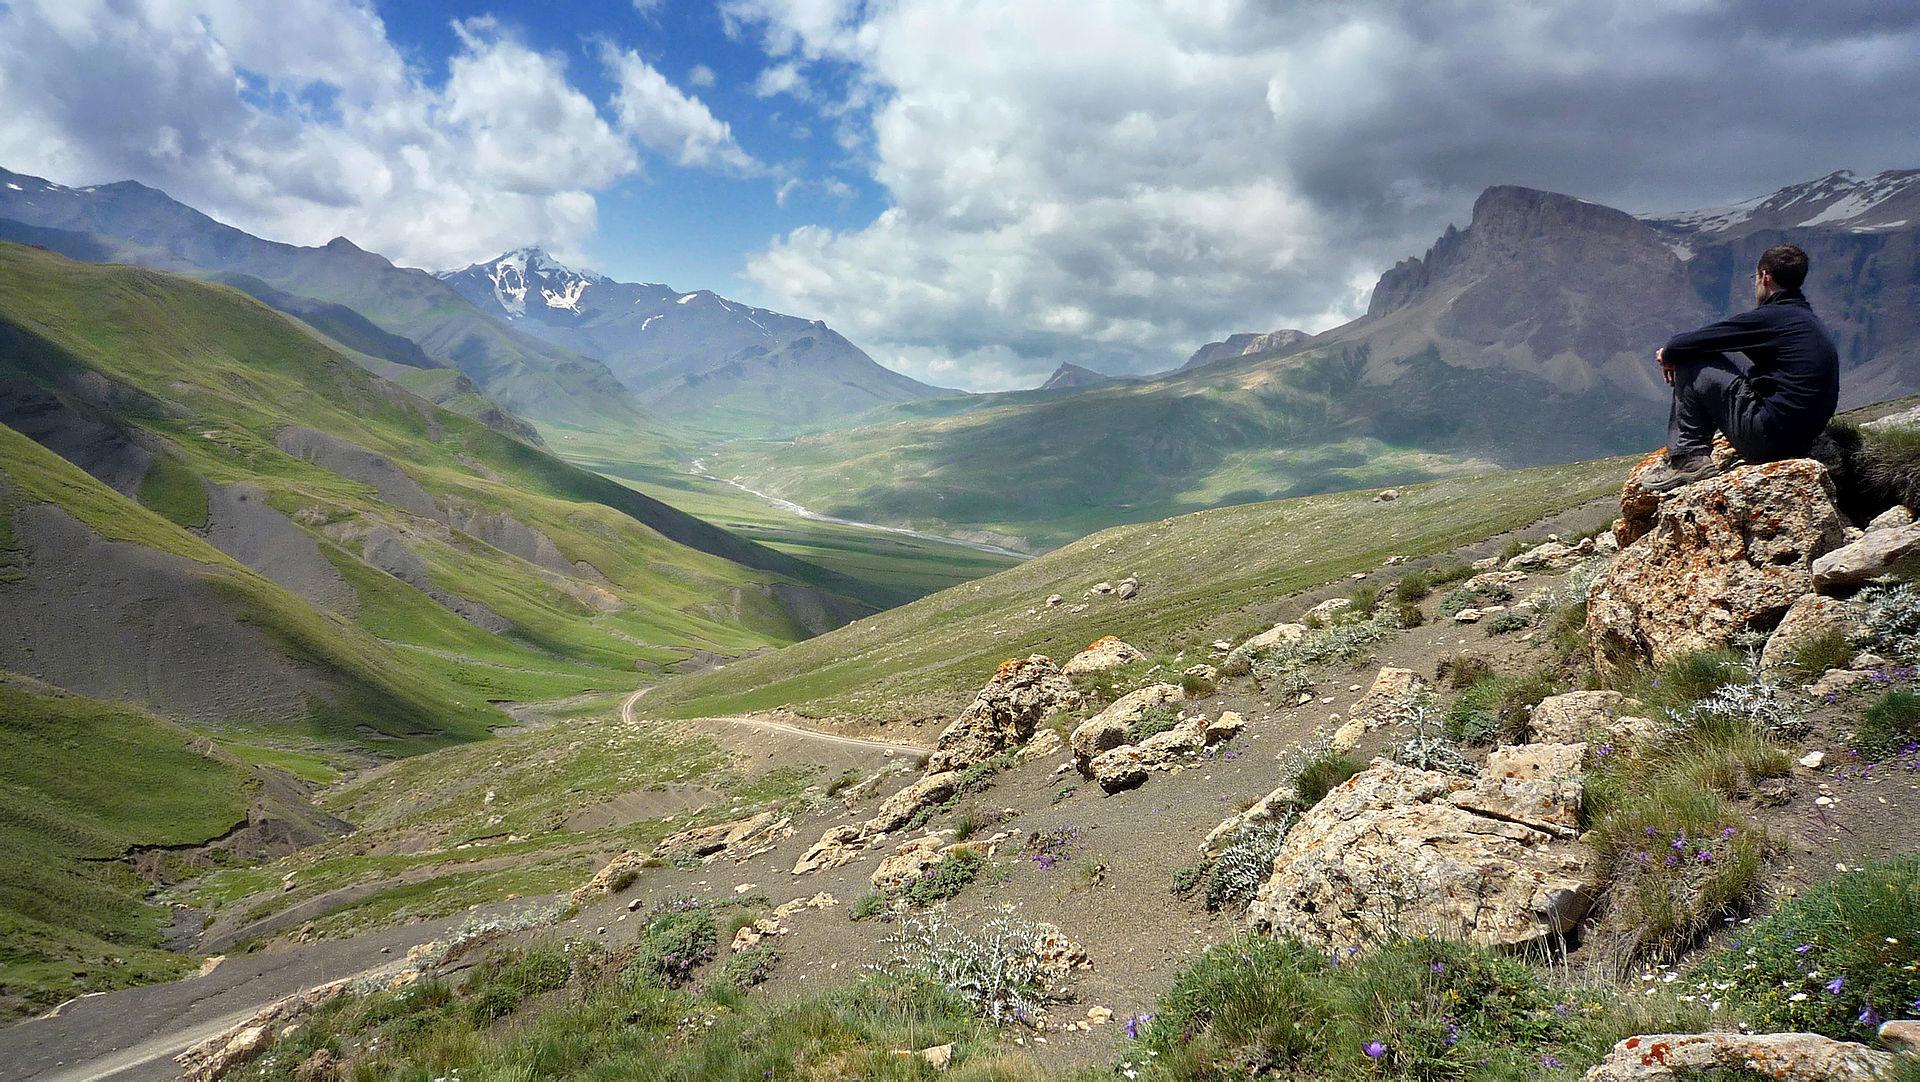 1920px-Azerbajiani_landscape_-_Another_version.jpg